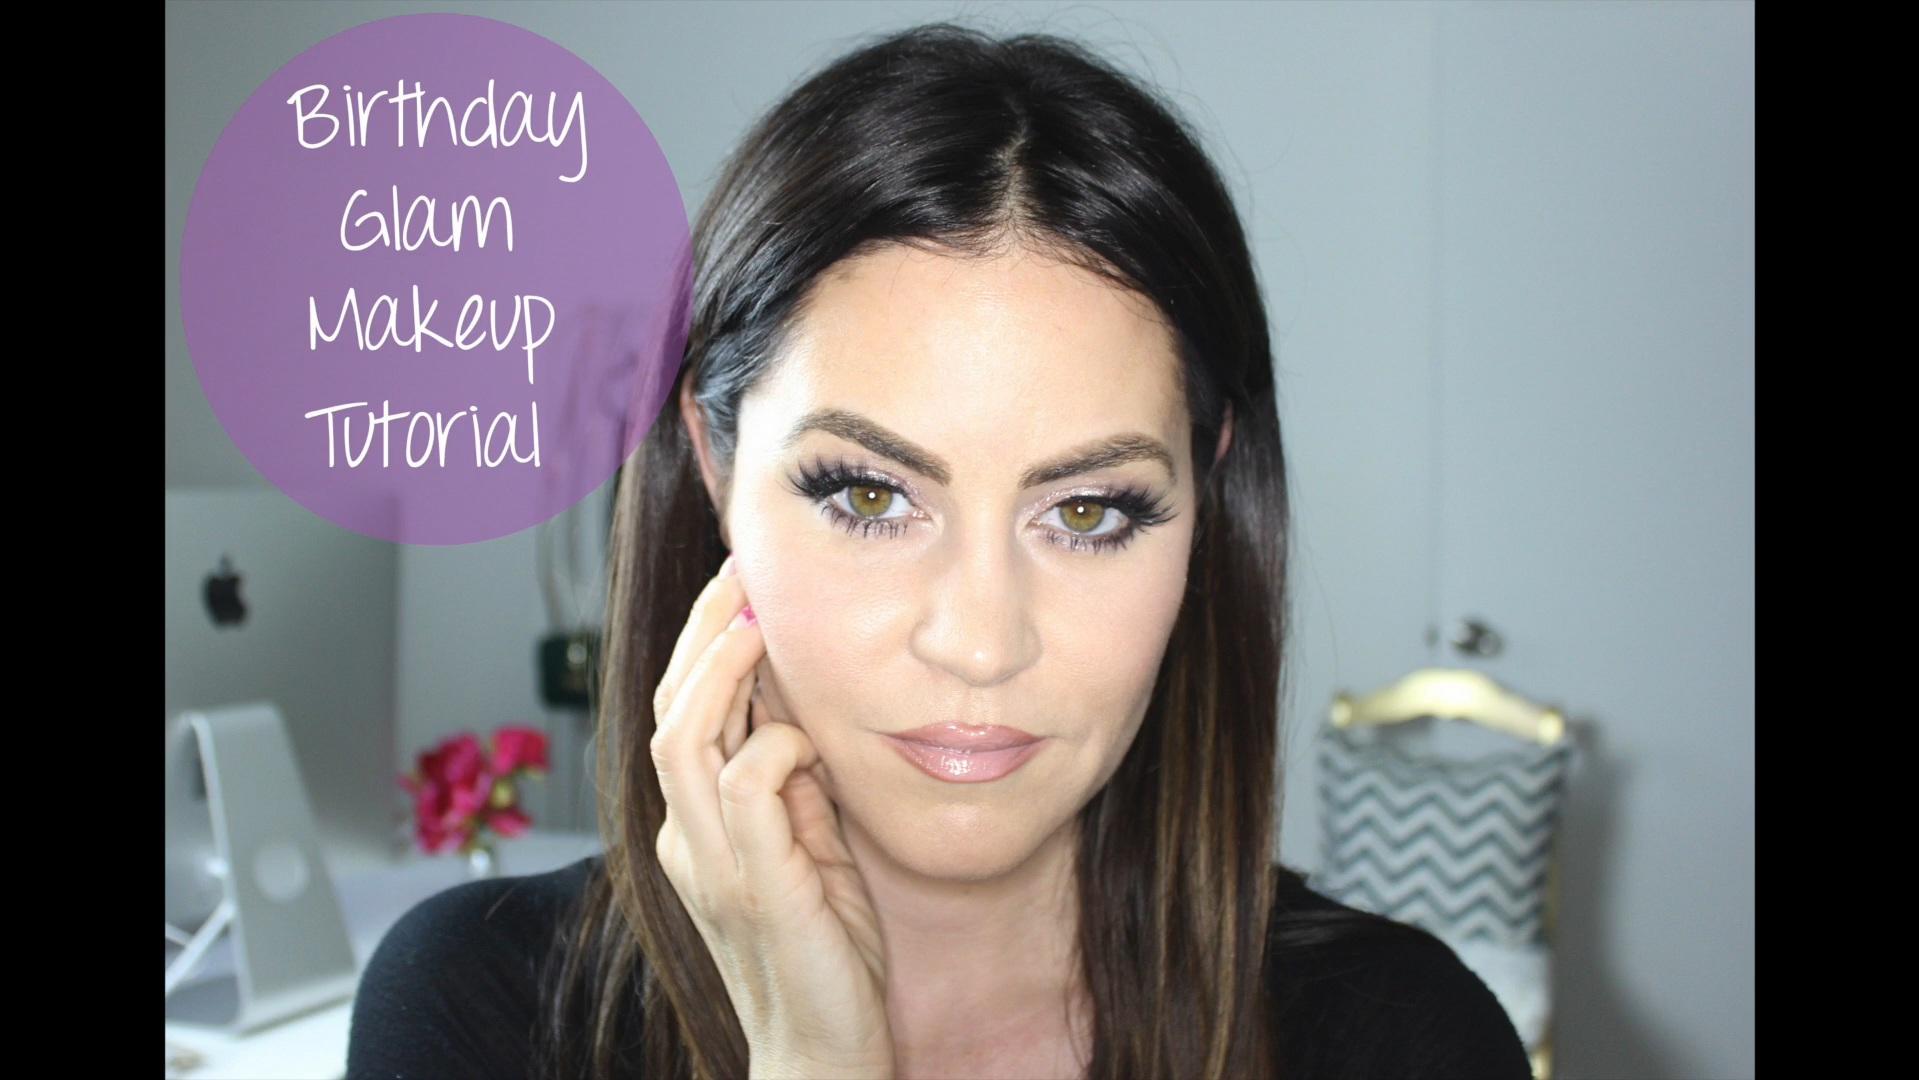 Birthday Glam Eye Makeup Tutorial